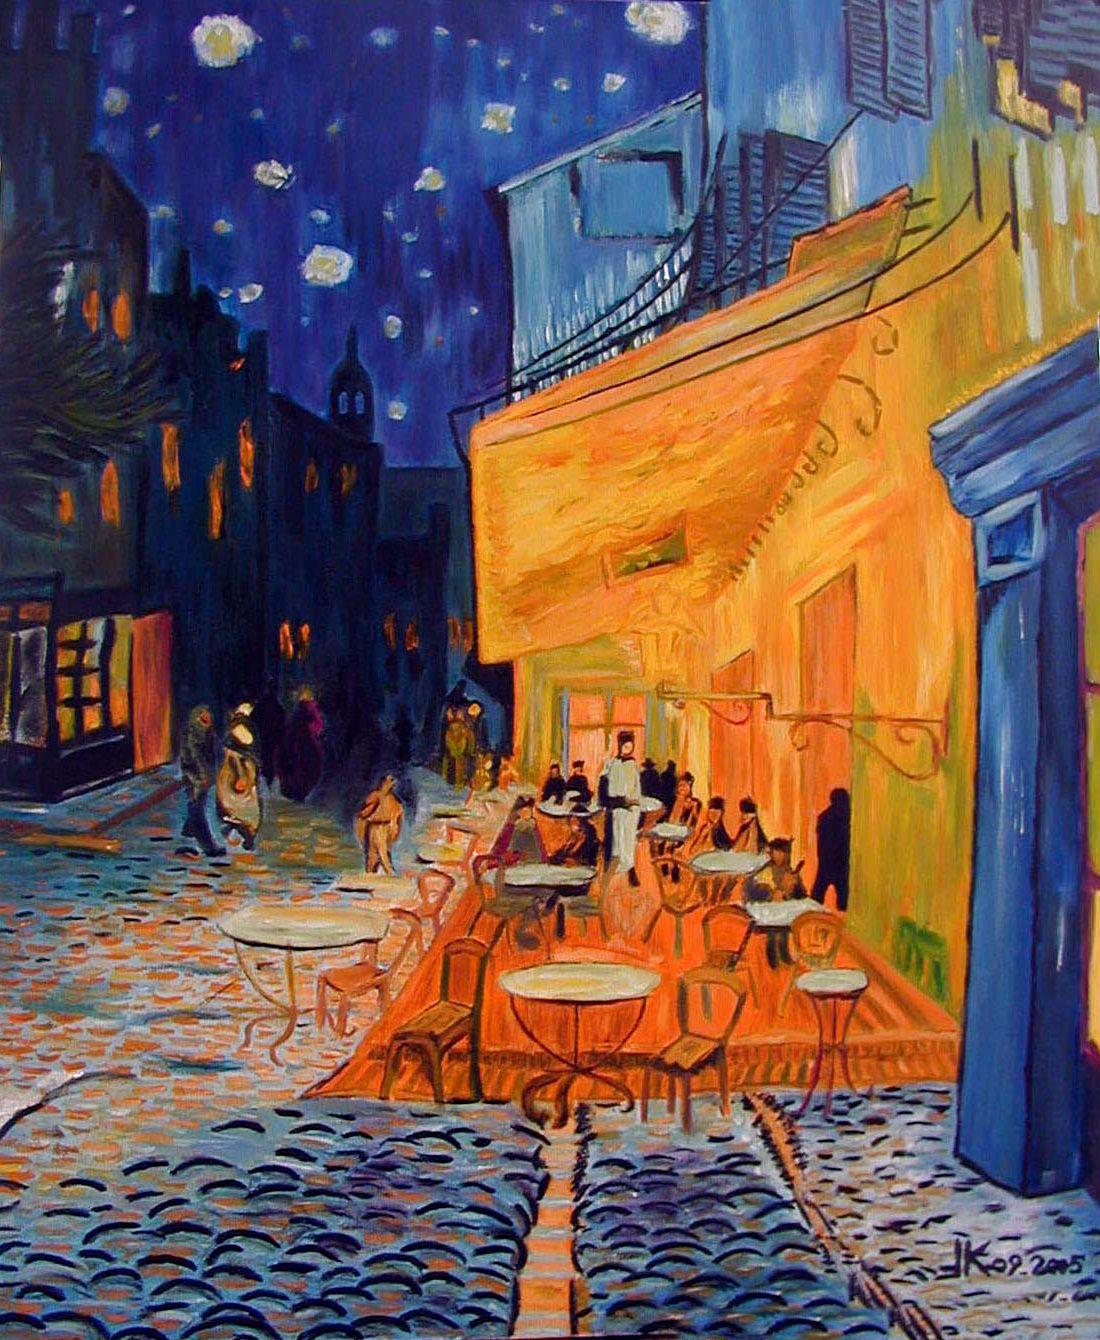 Terrasse De Cafe La Nuit Vincent Van Gogh Art In 2018 Arte